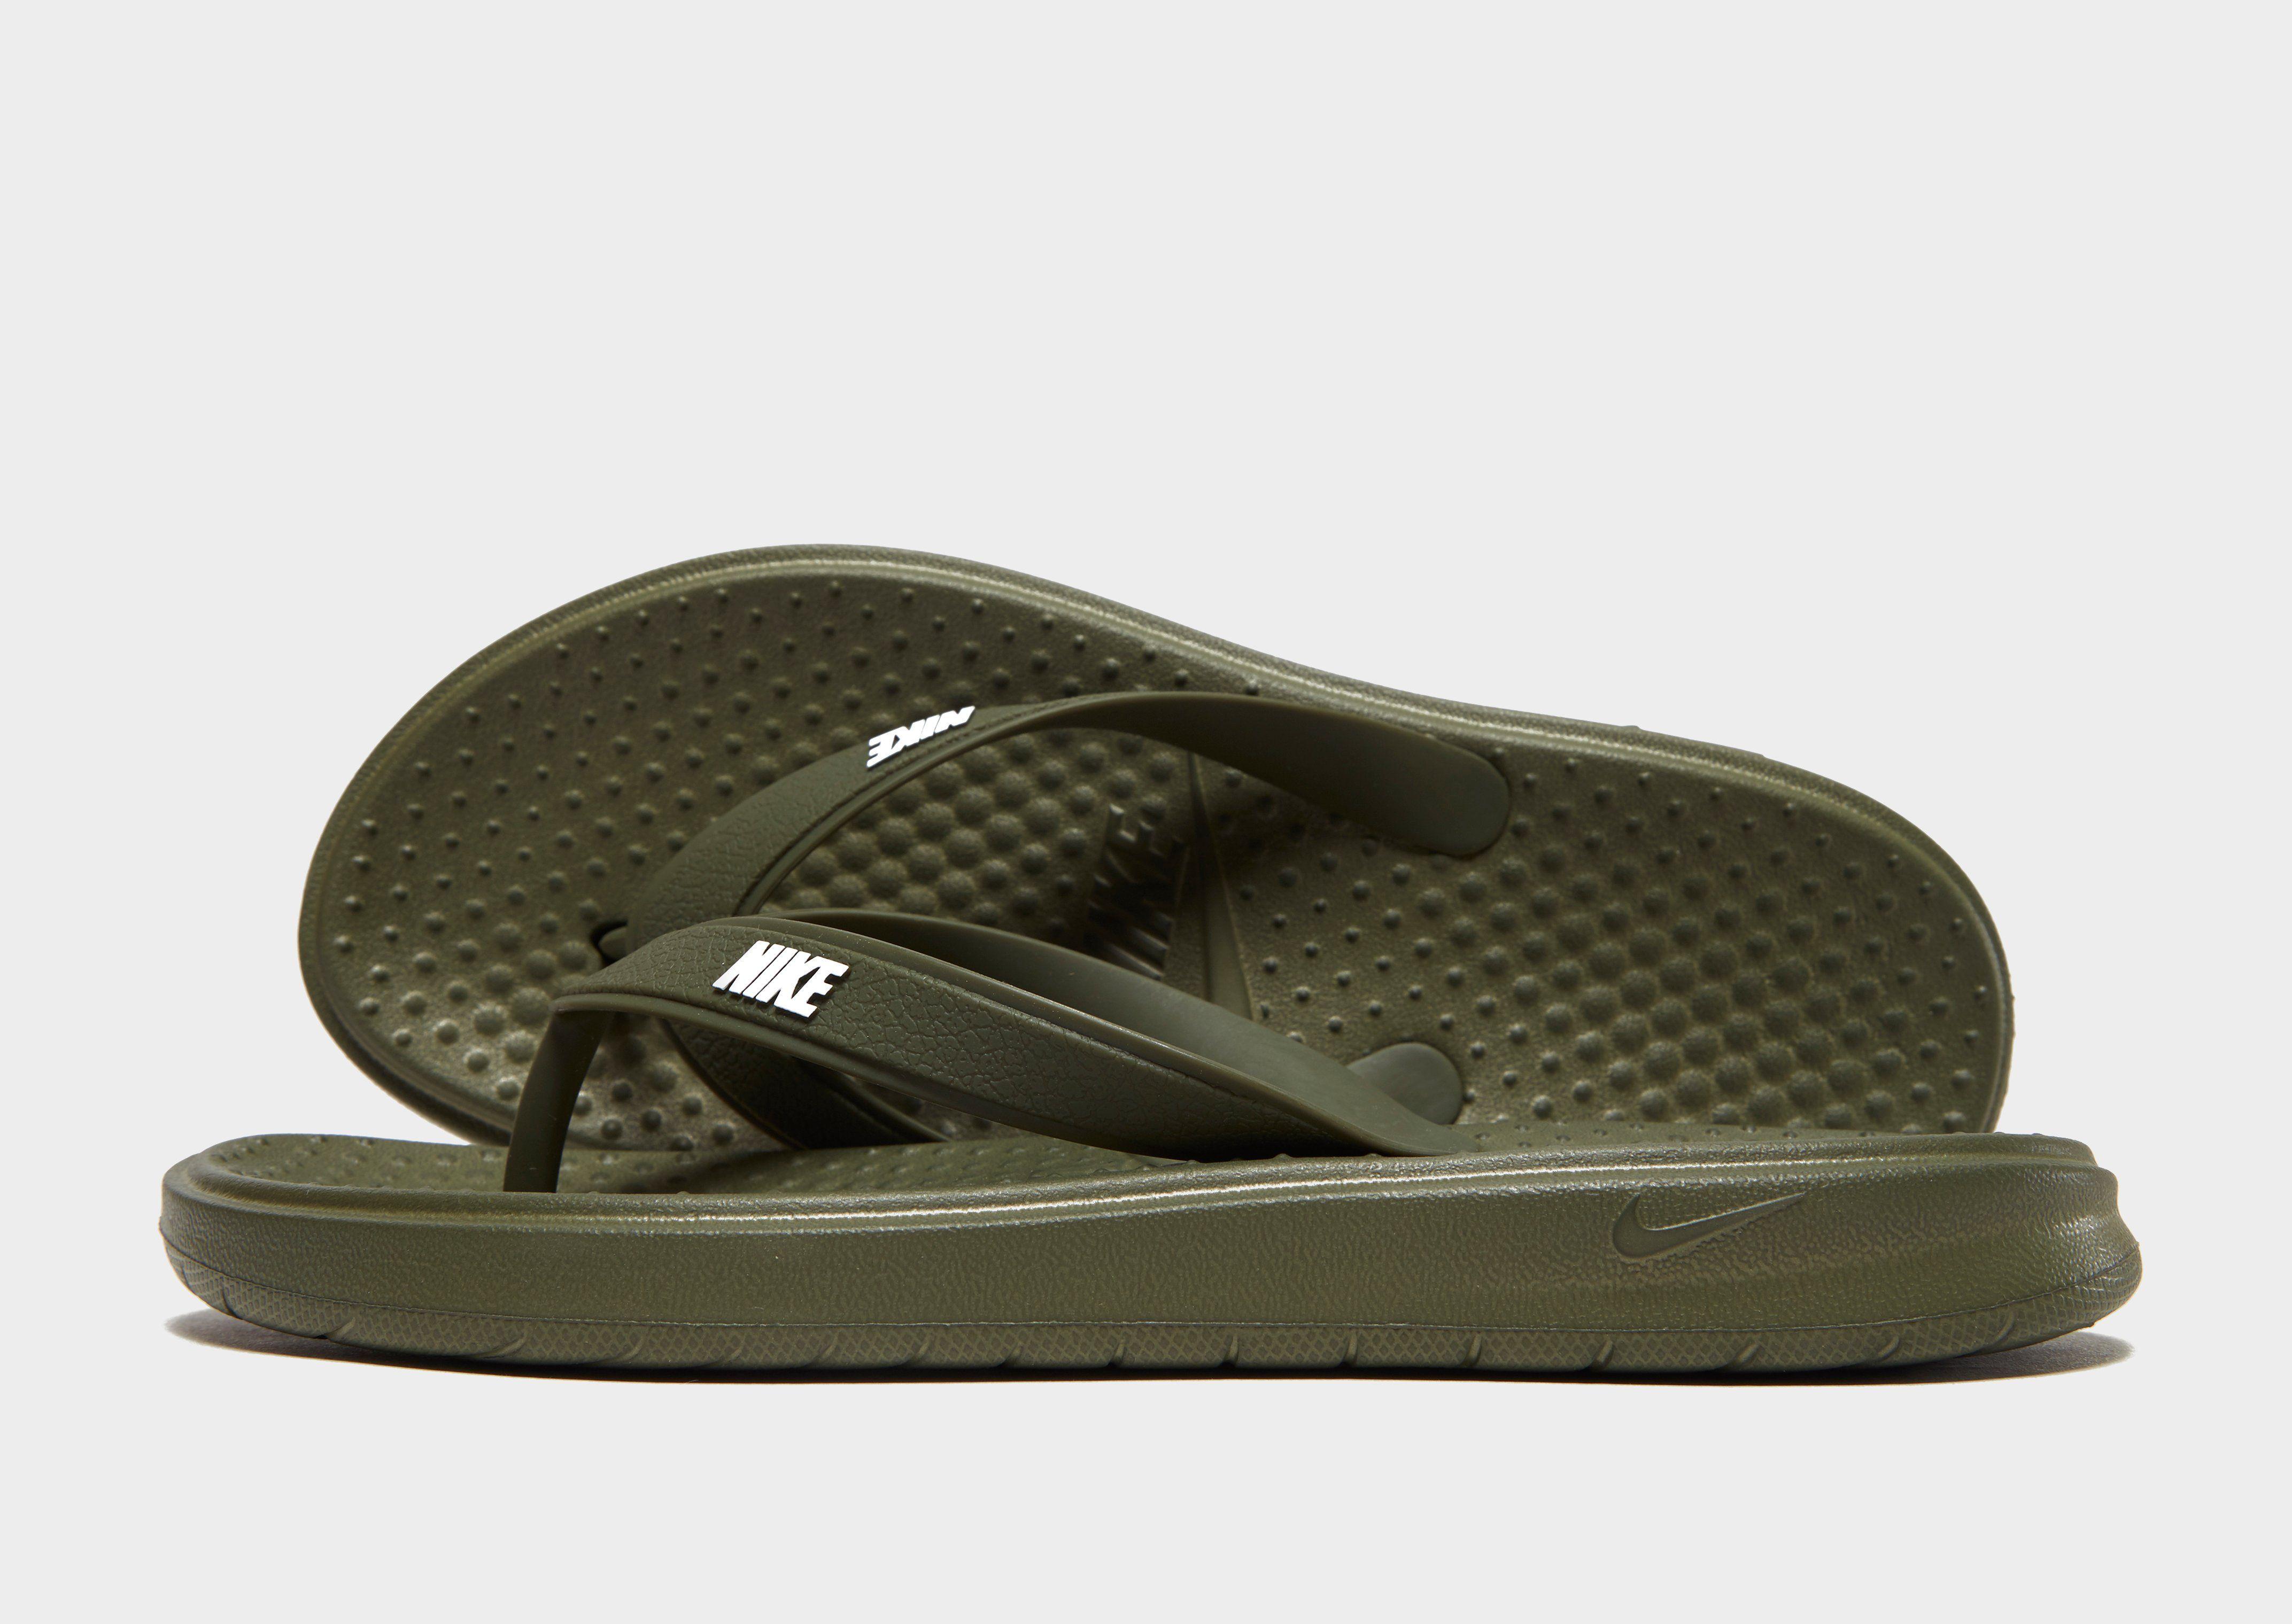 479794c481ab4 Nike Solay Flip Flops